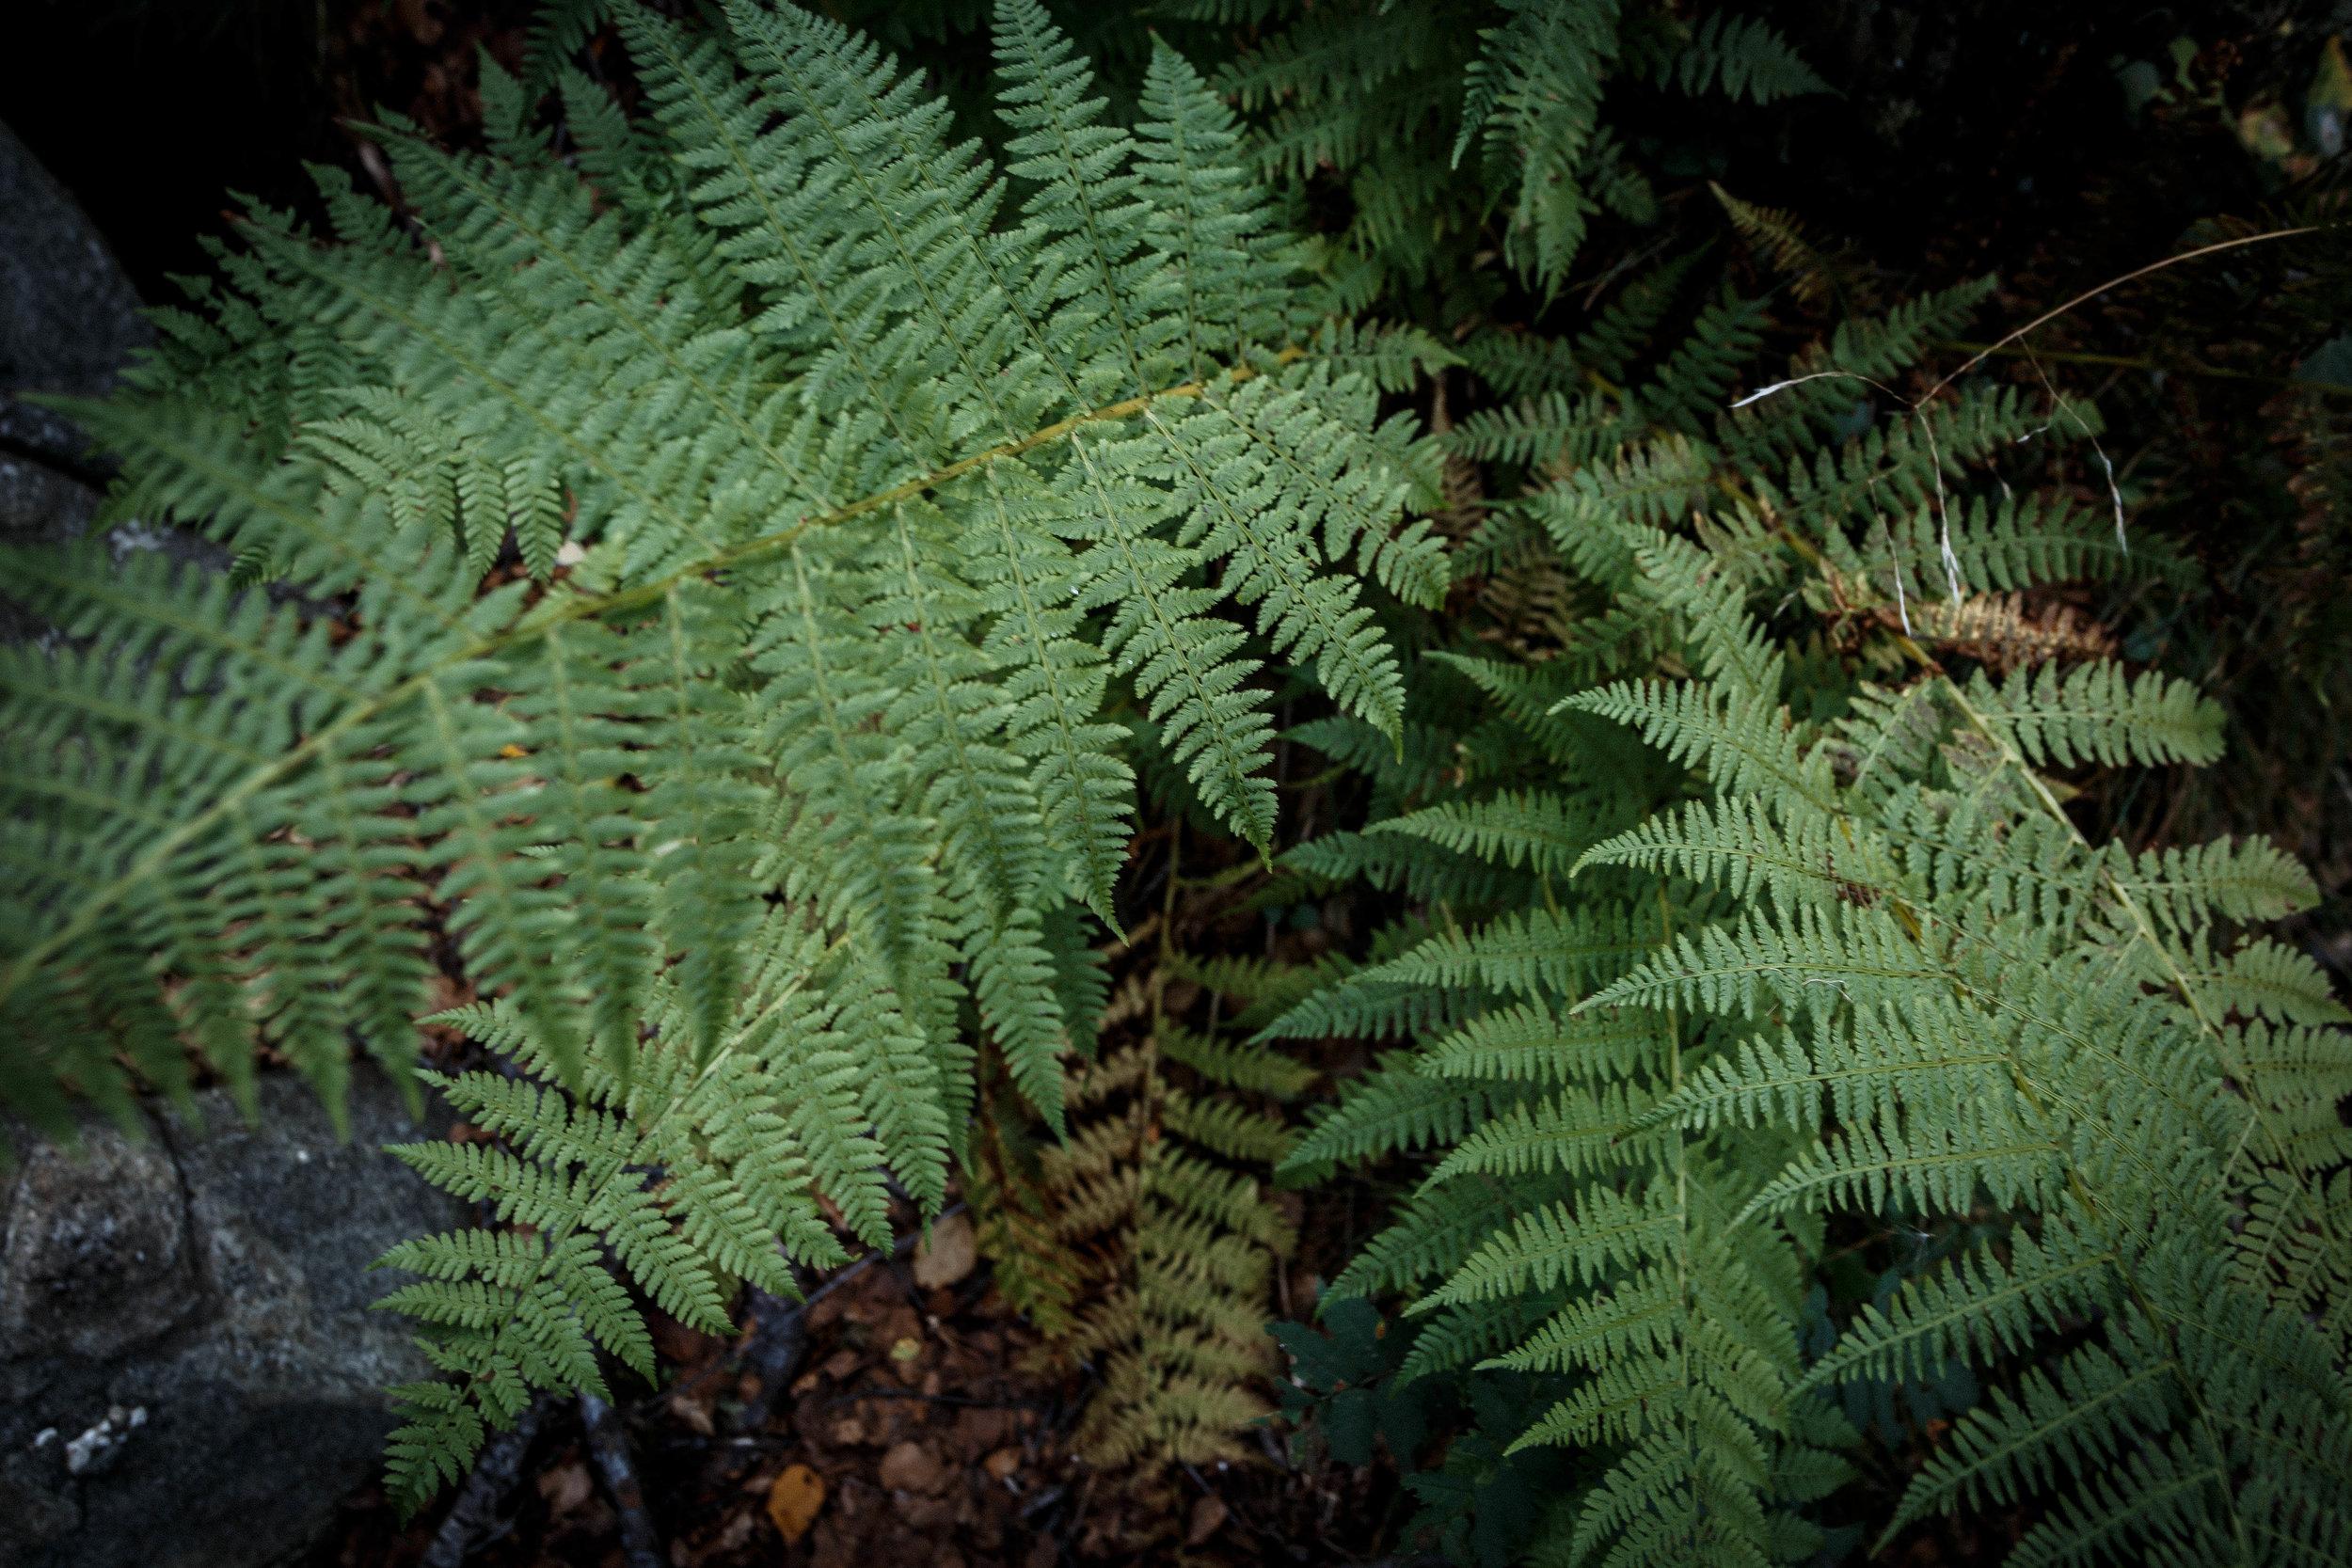 North_forest_3.jpg